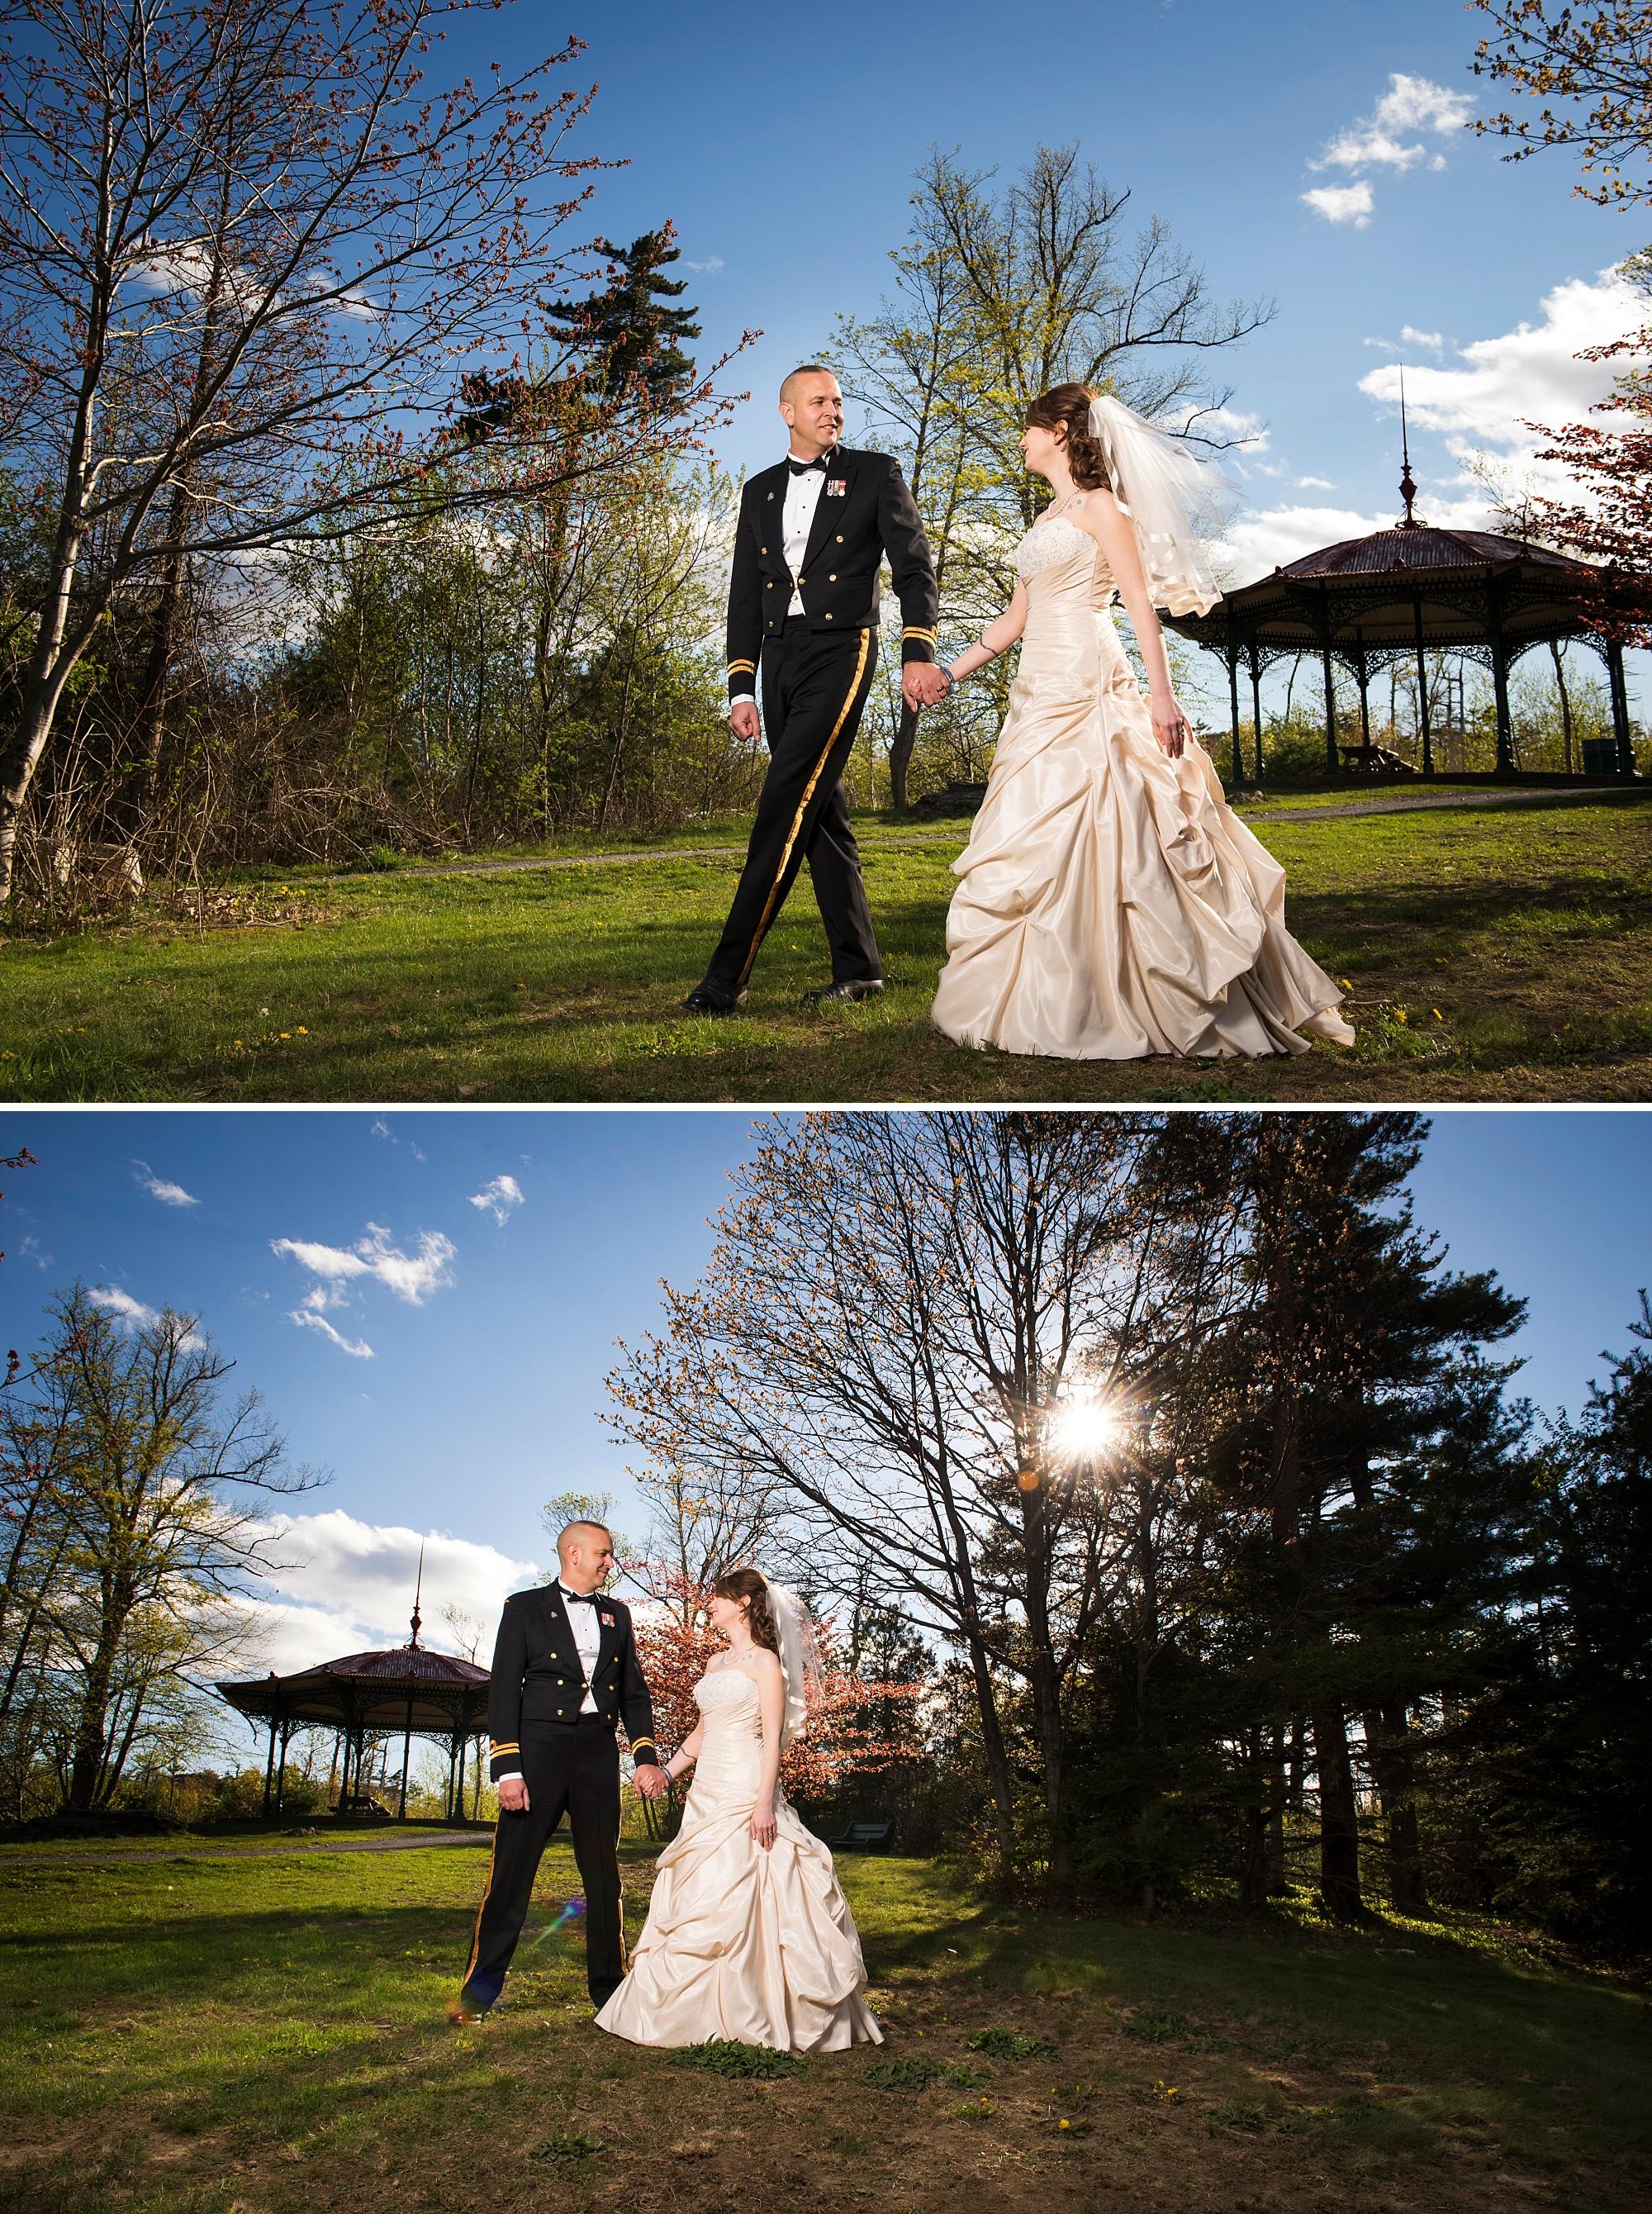 Juno towers wedding